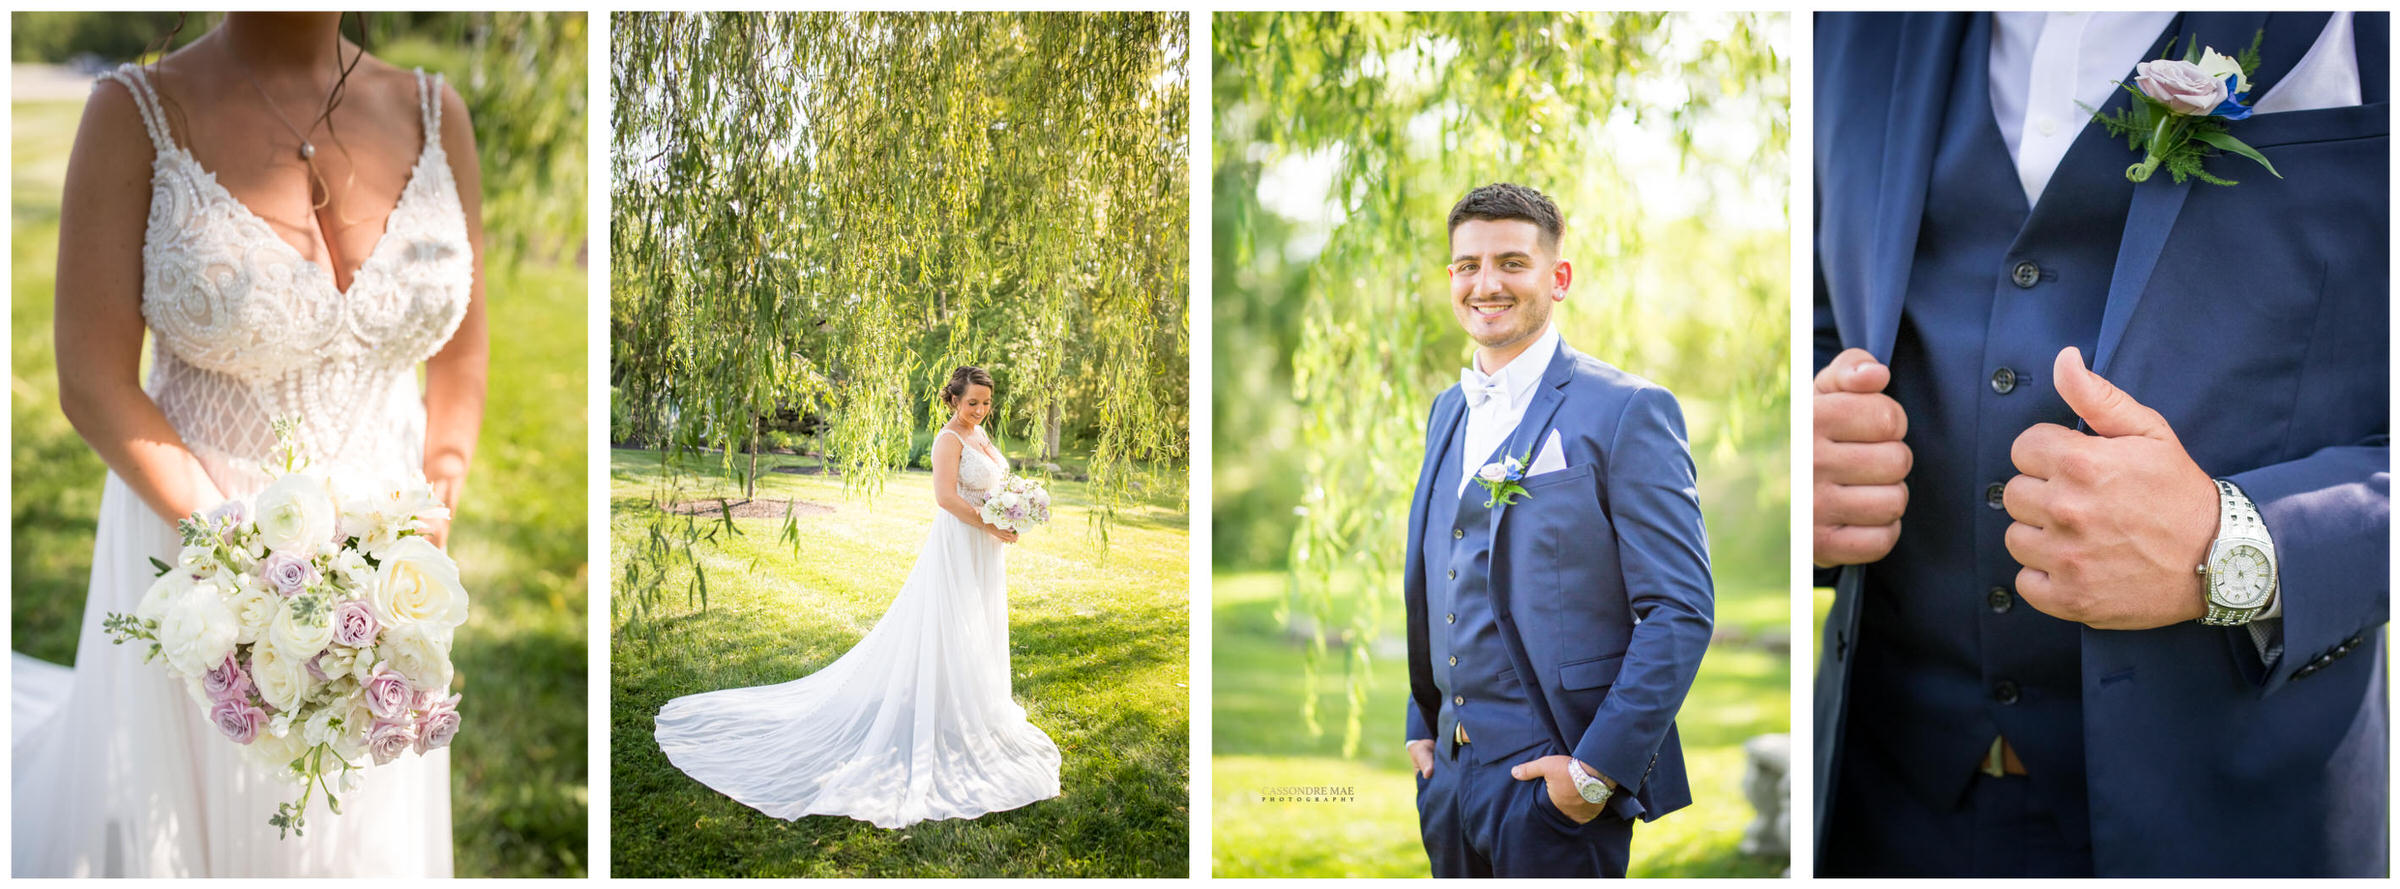 Cassondre Mae Photography Villa Venezia Wedding Photographer 26.jpg